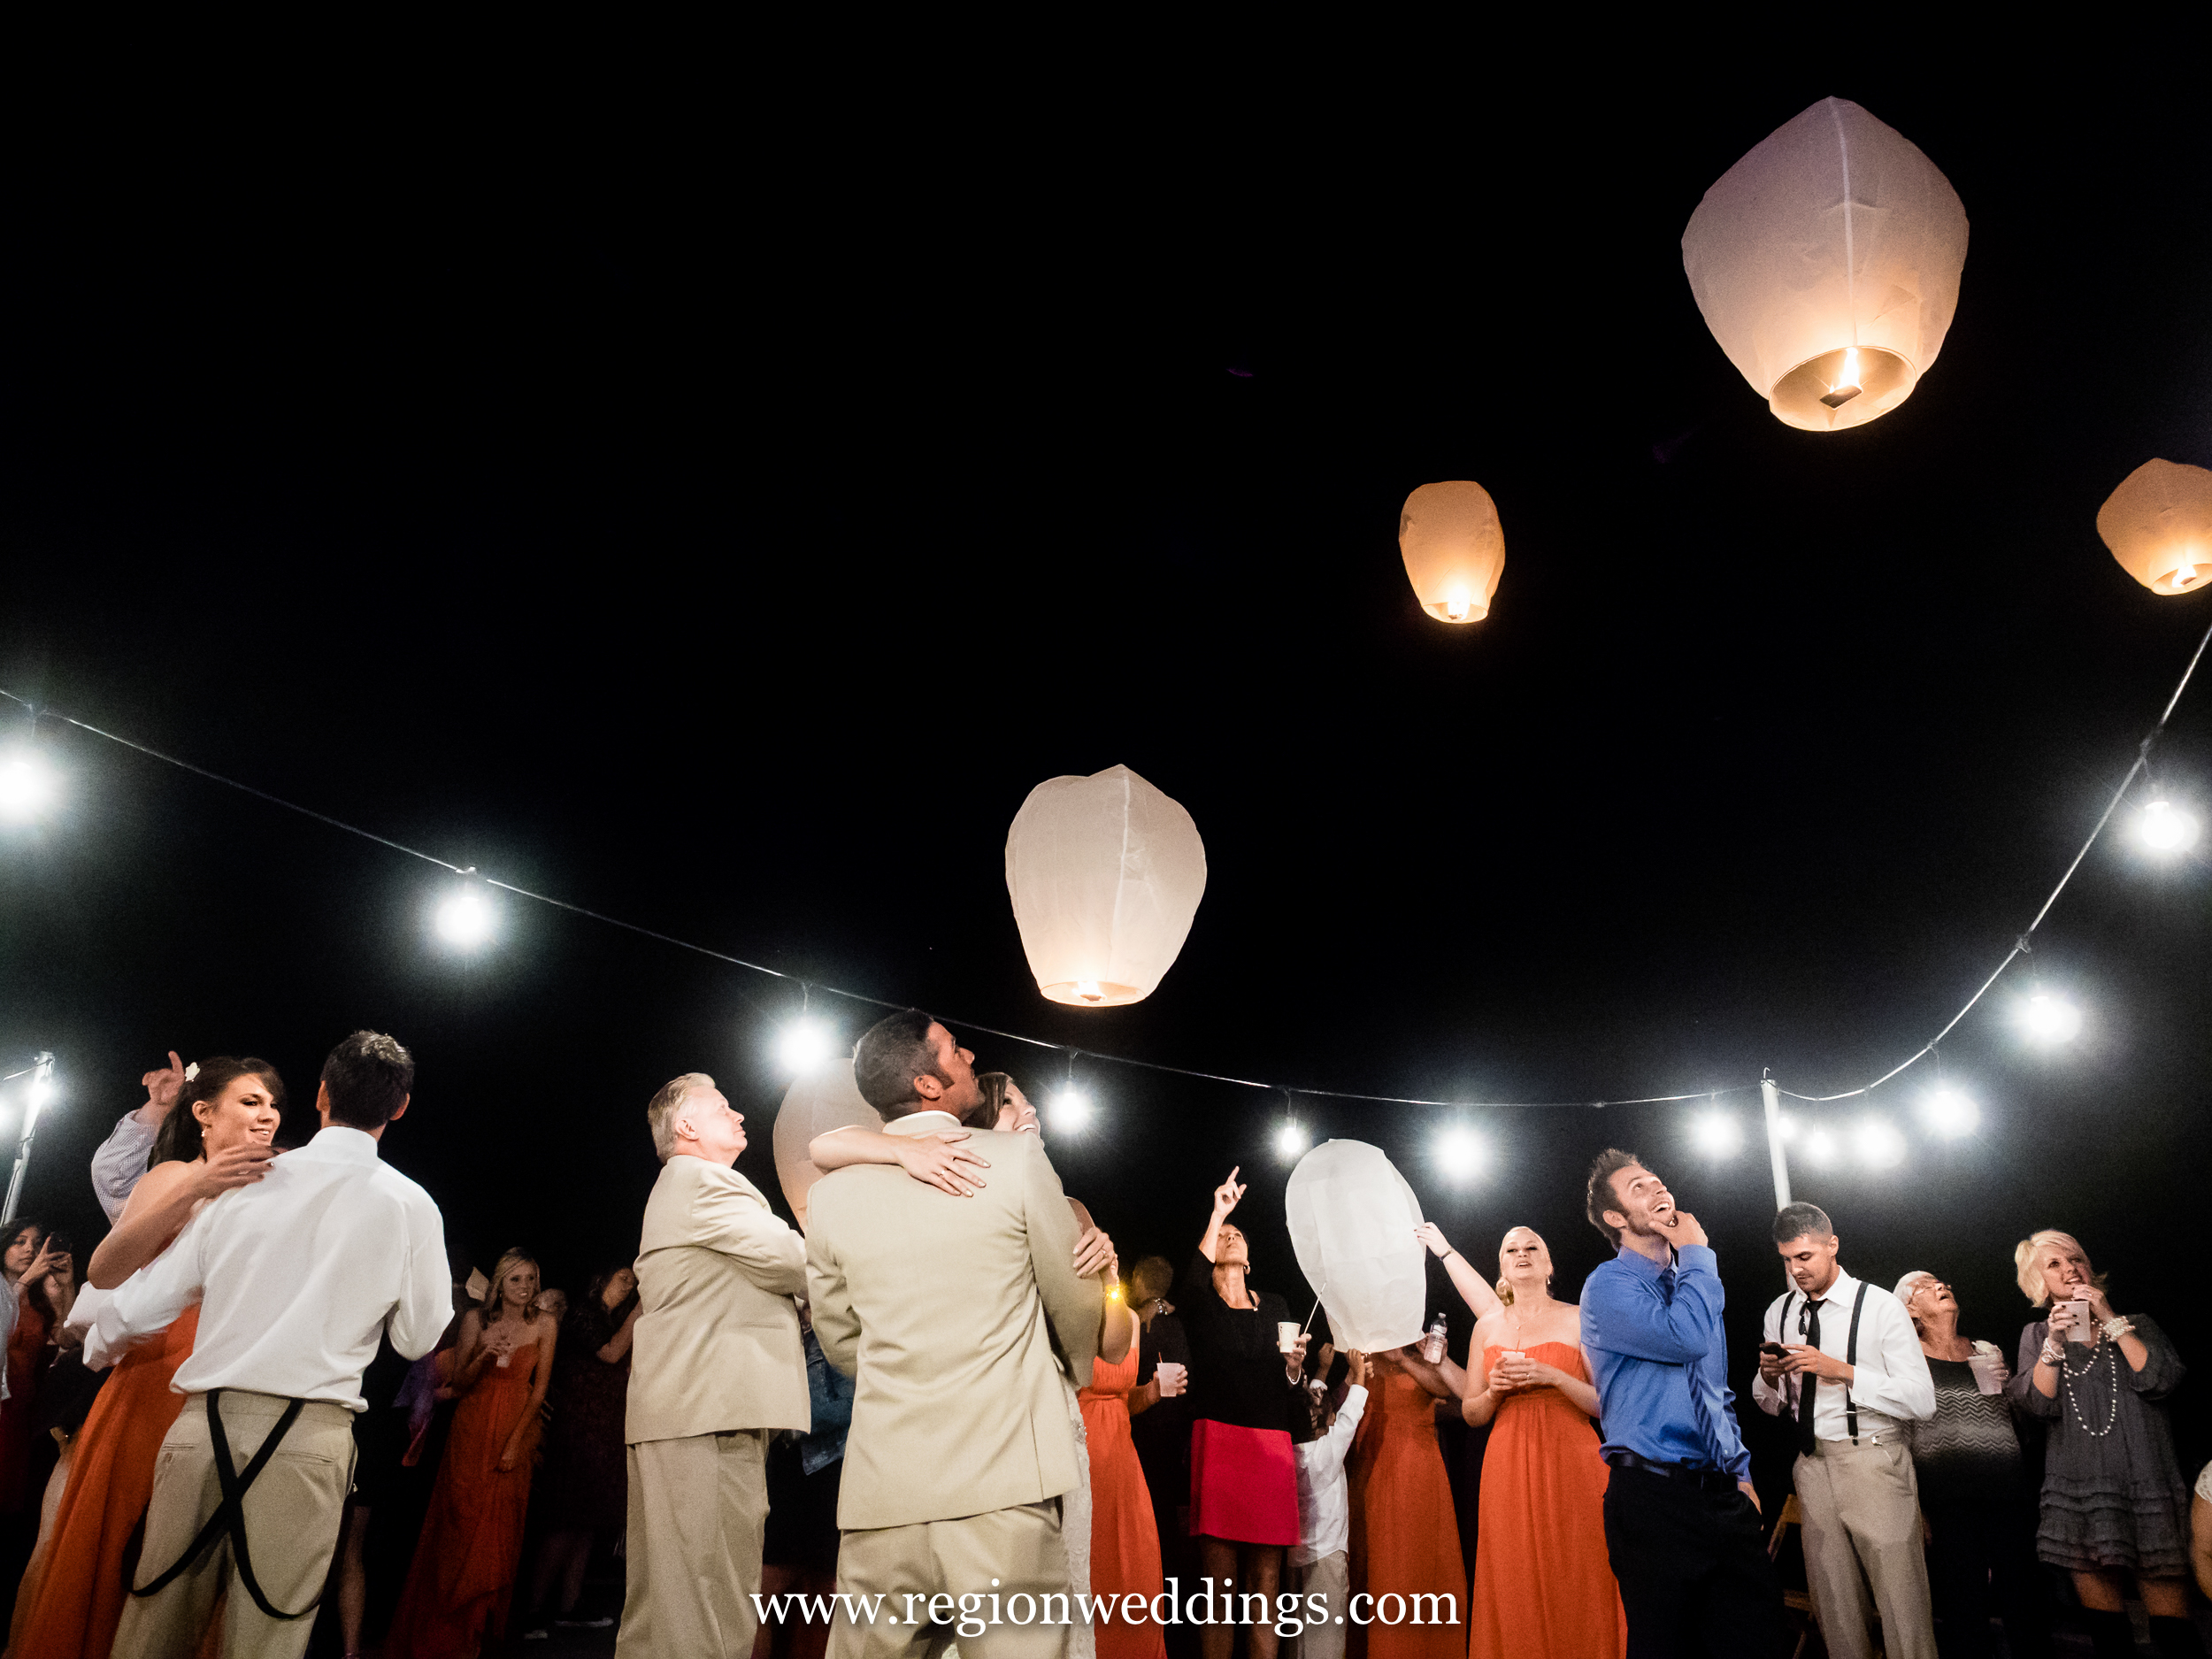 Sky lanterns fill the night sky at an outdoor wedding reception.